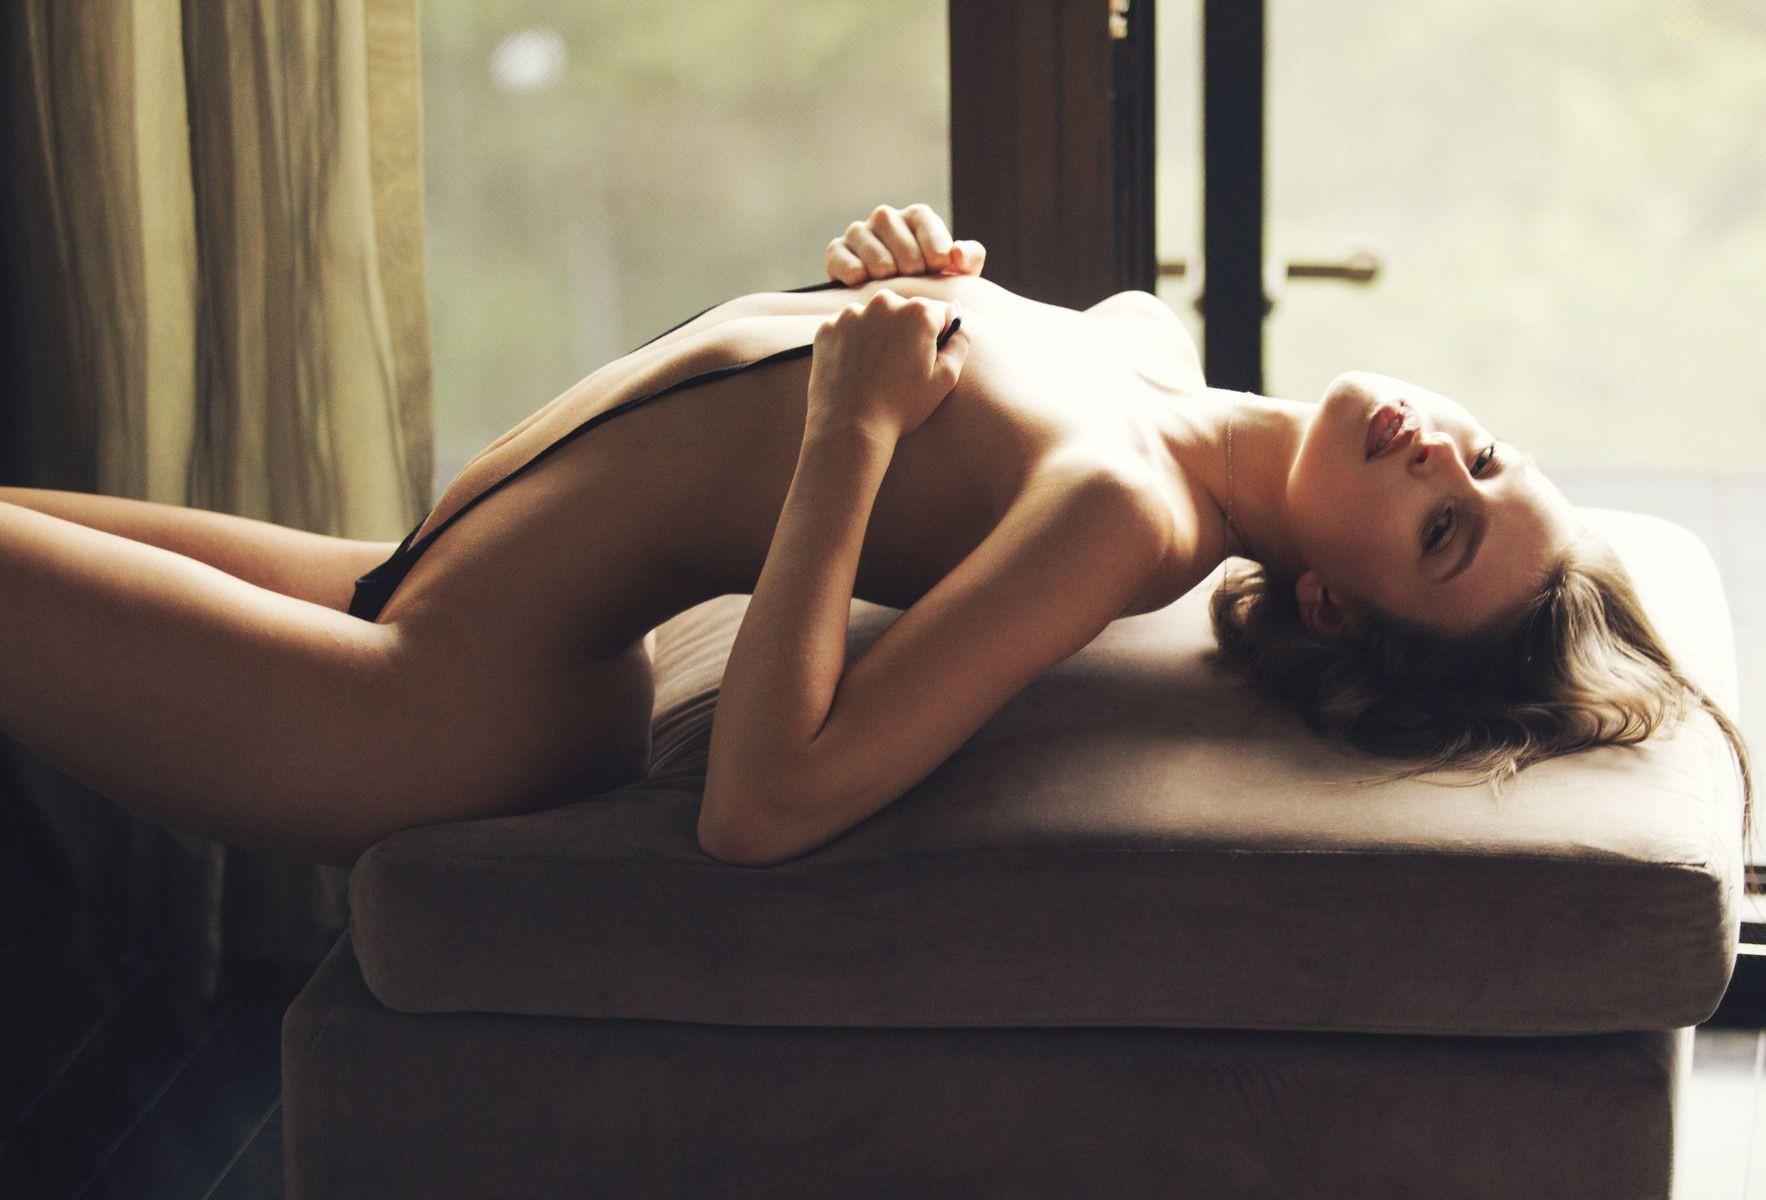 Irina lexi nude images, pising girl